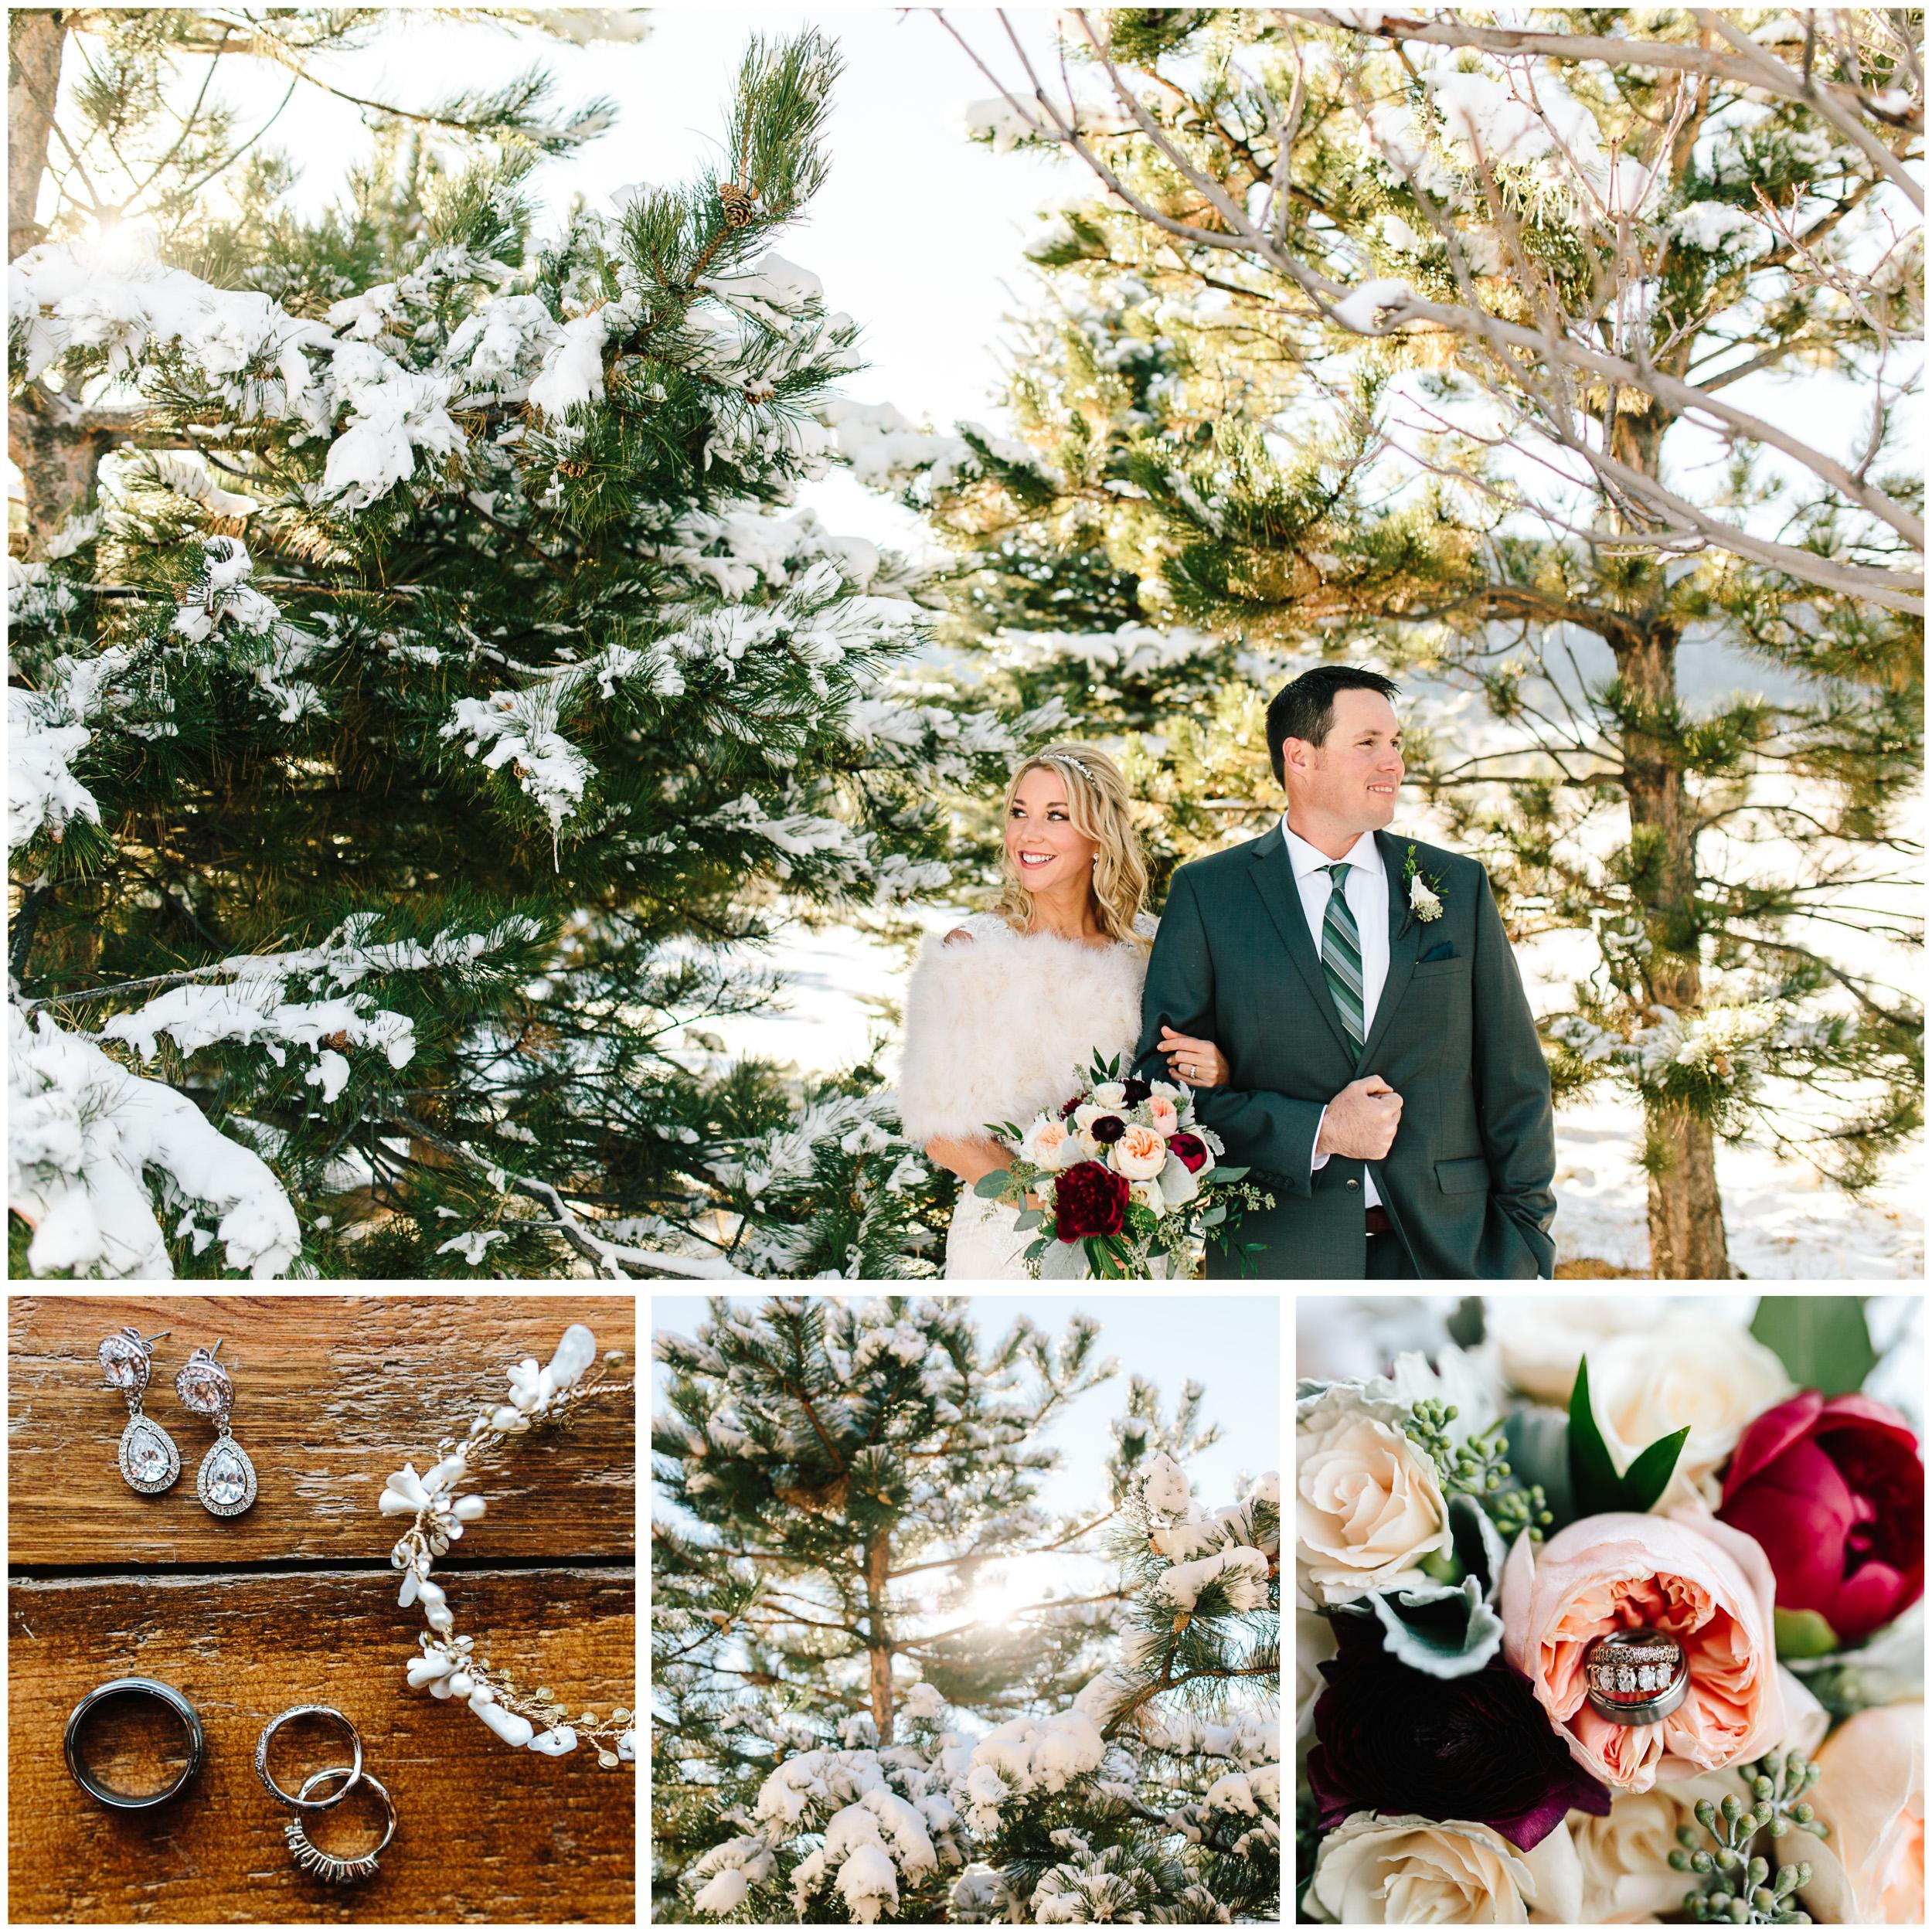 spruce_mountain_ranch_wedding_header_.jpg